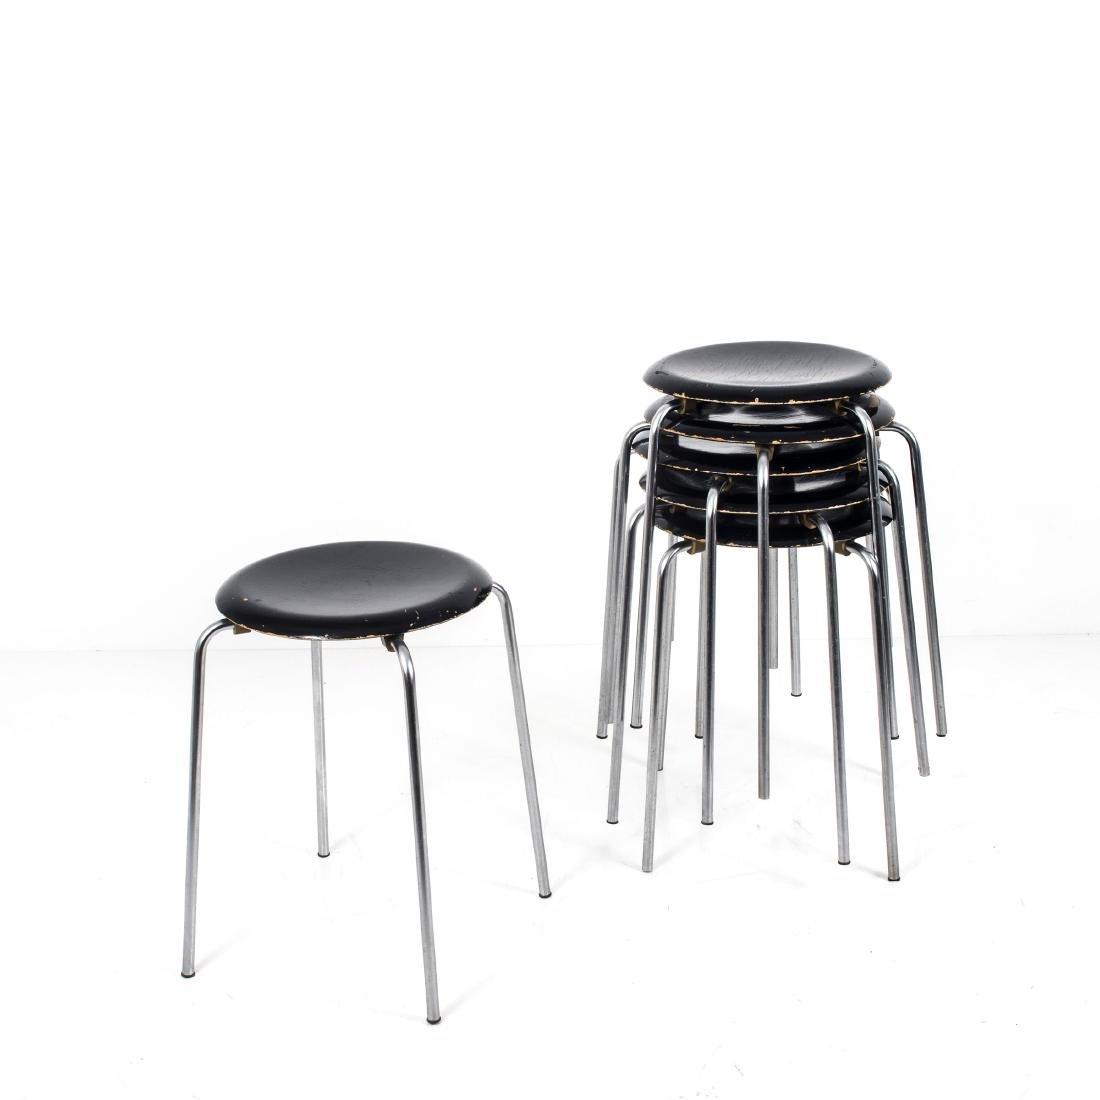 Six 'Dot' - '3170' stacking stools, c. 1955 - 3